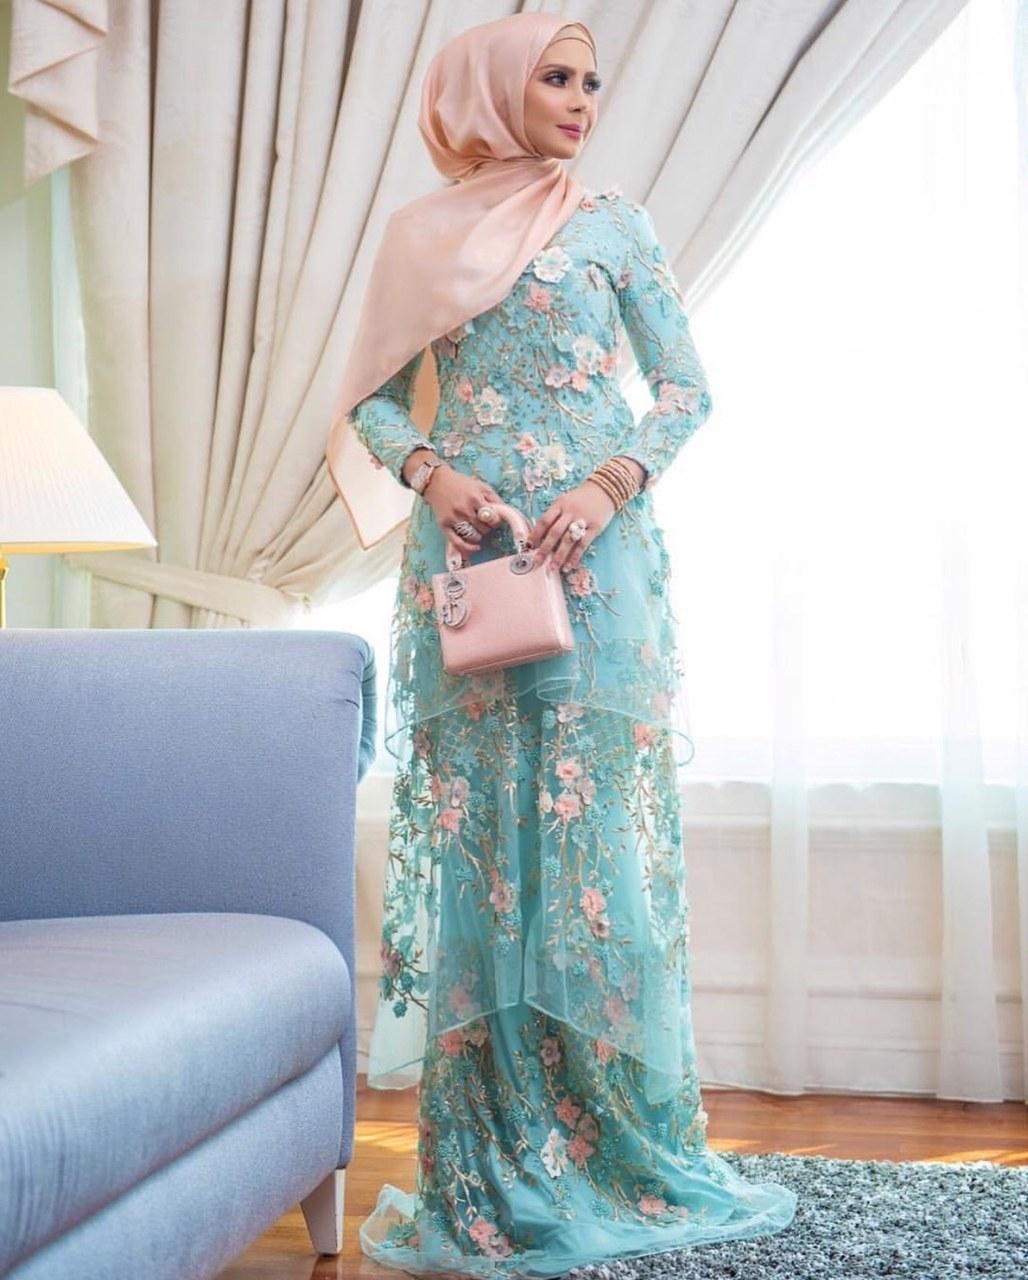 Model Baju Lebaran Tahun 2019 Tldn Ide Populer 38 Baju Raya Artis 2019